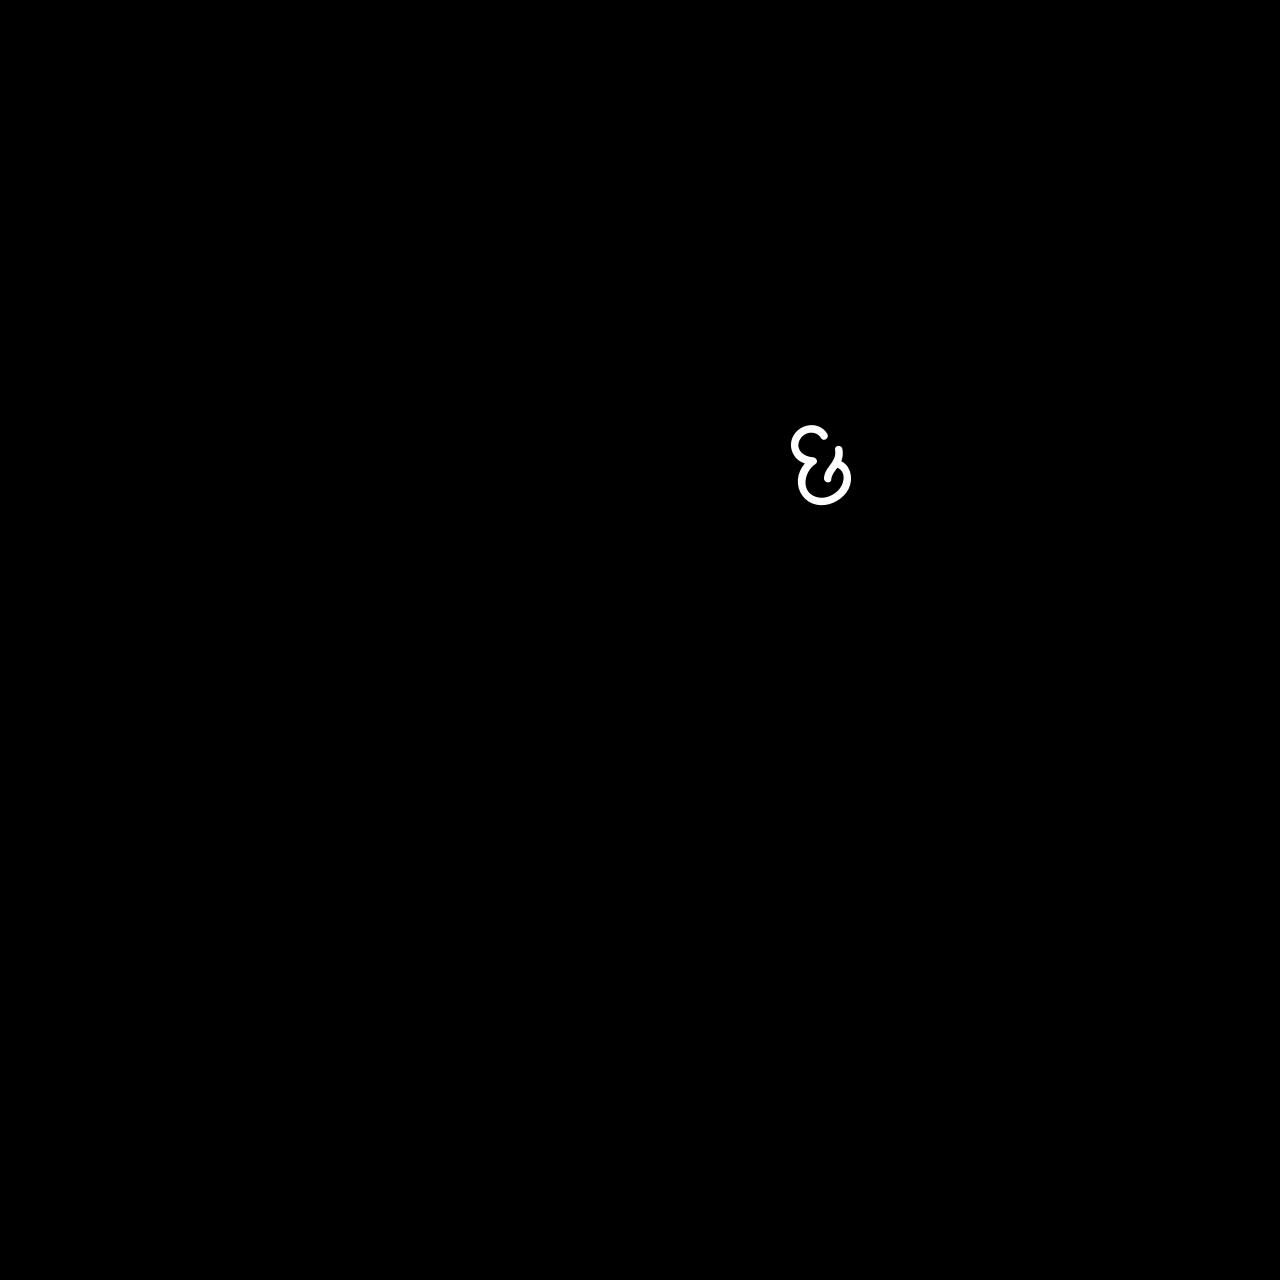 Logo_01_BLK.png